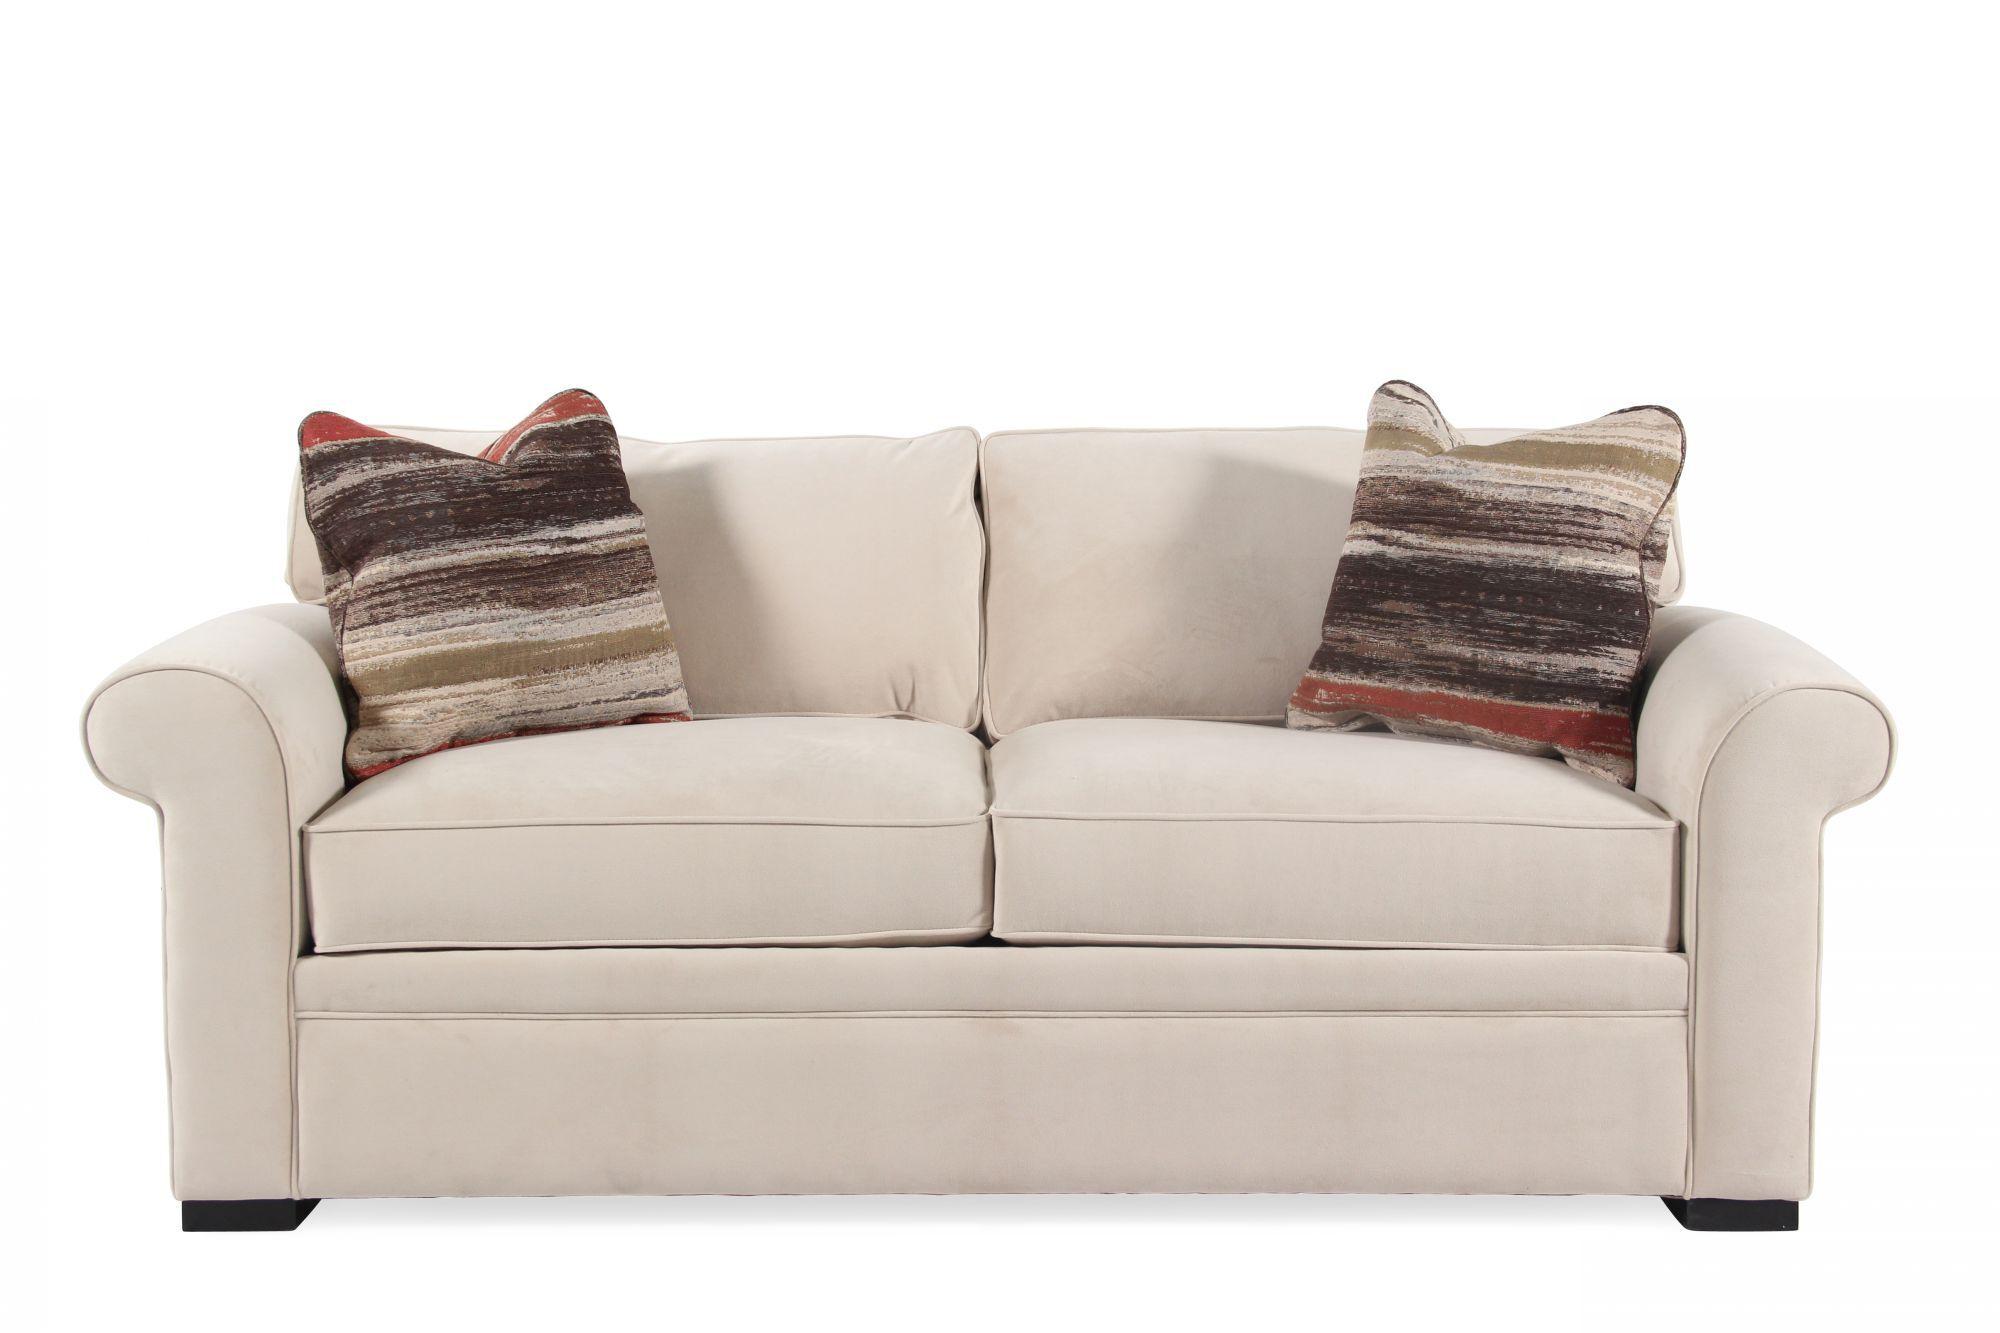 kensington sofa bed reviews 3 in 1 corner storage cream sleeper furniture twin size new ...